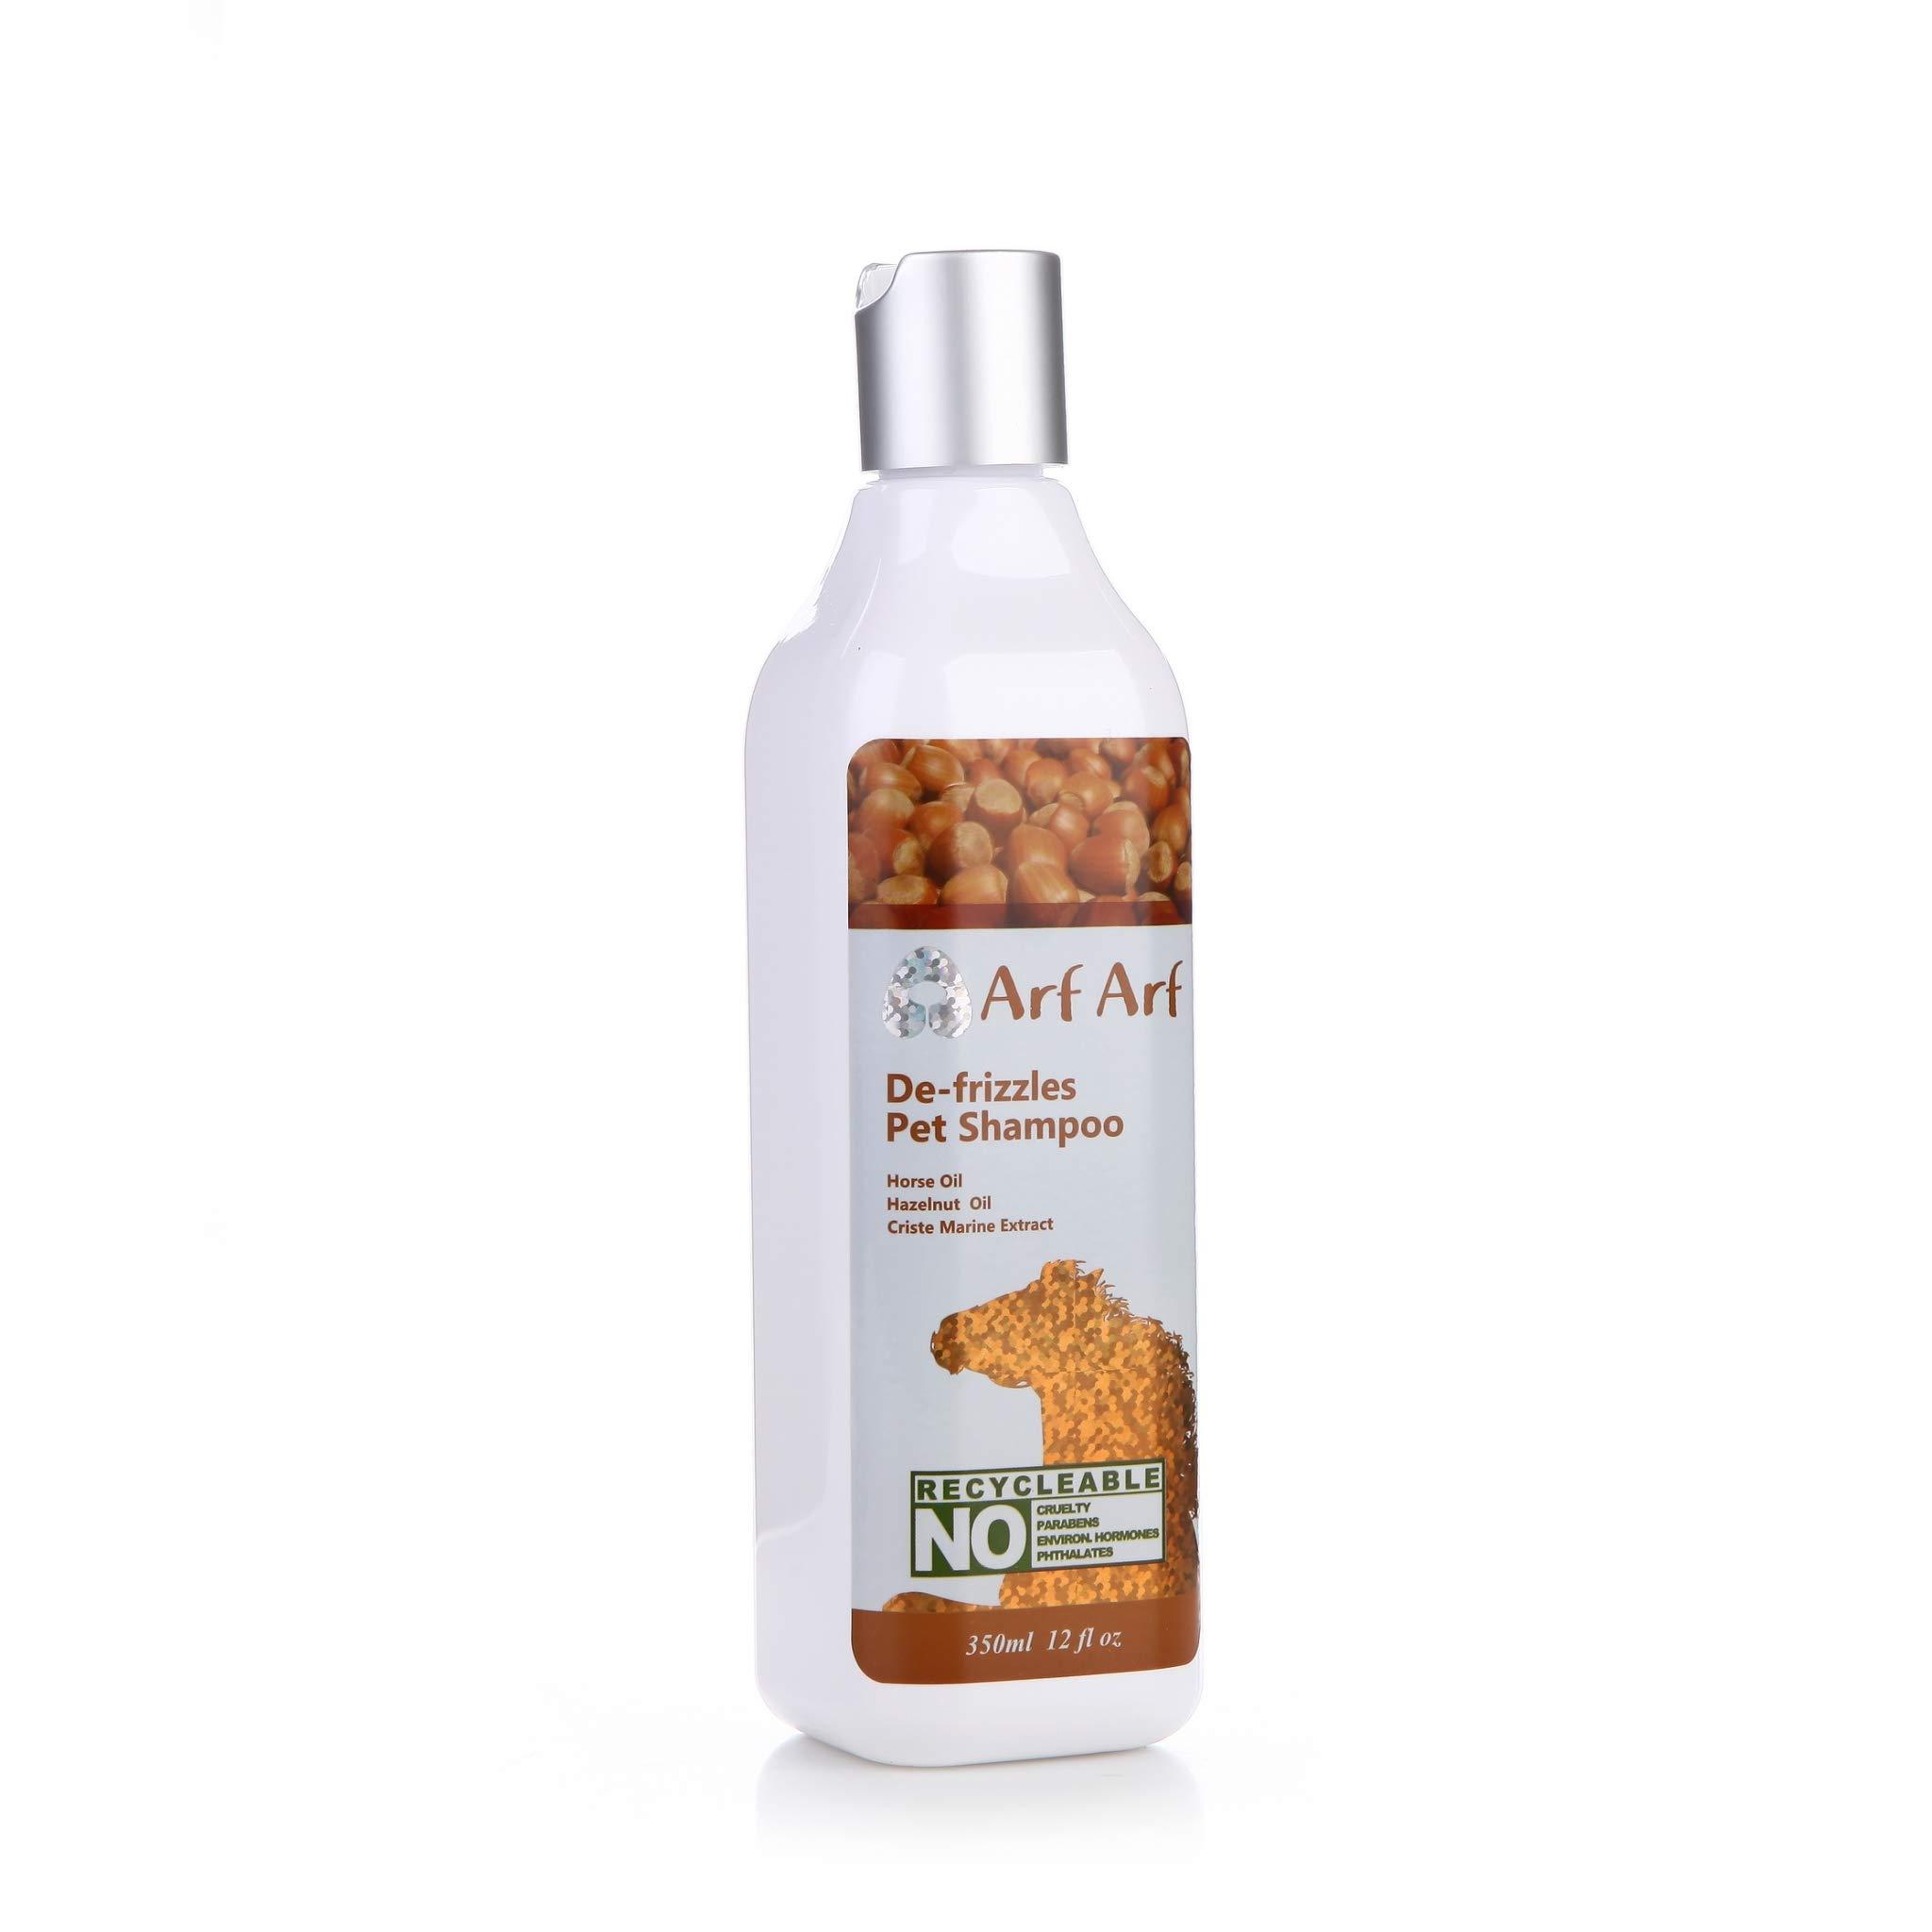 Arf Arf De-frizzles Pet Shampoo (For All Dogs & Cats) -Horse Oil, Hazelnut Oil, Criste Marine Extract, 13 Oz